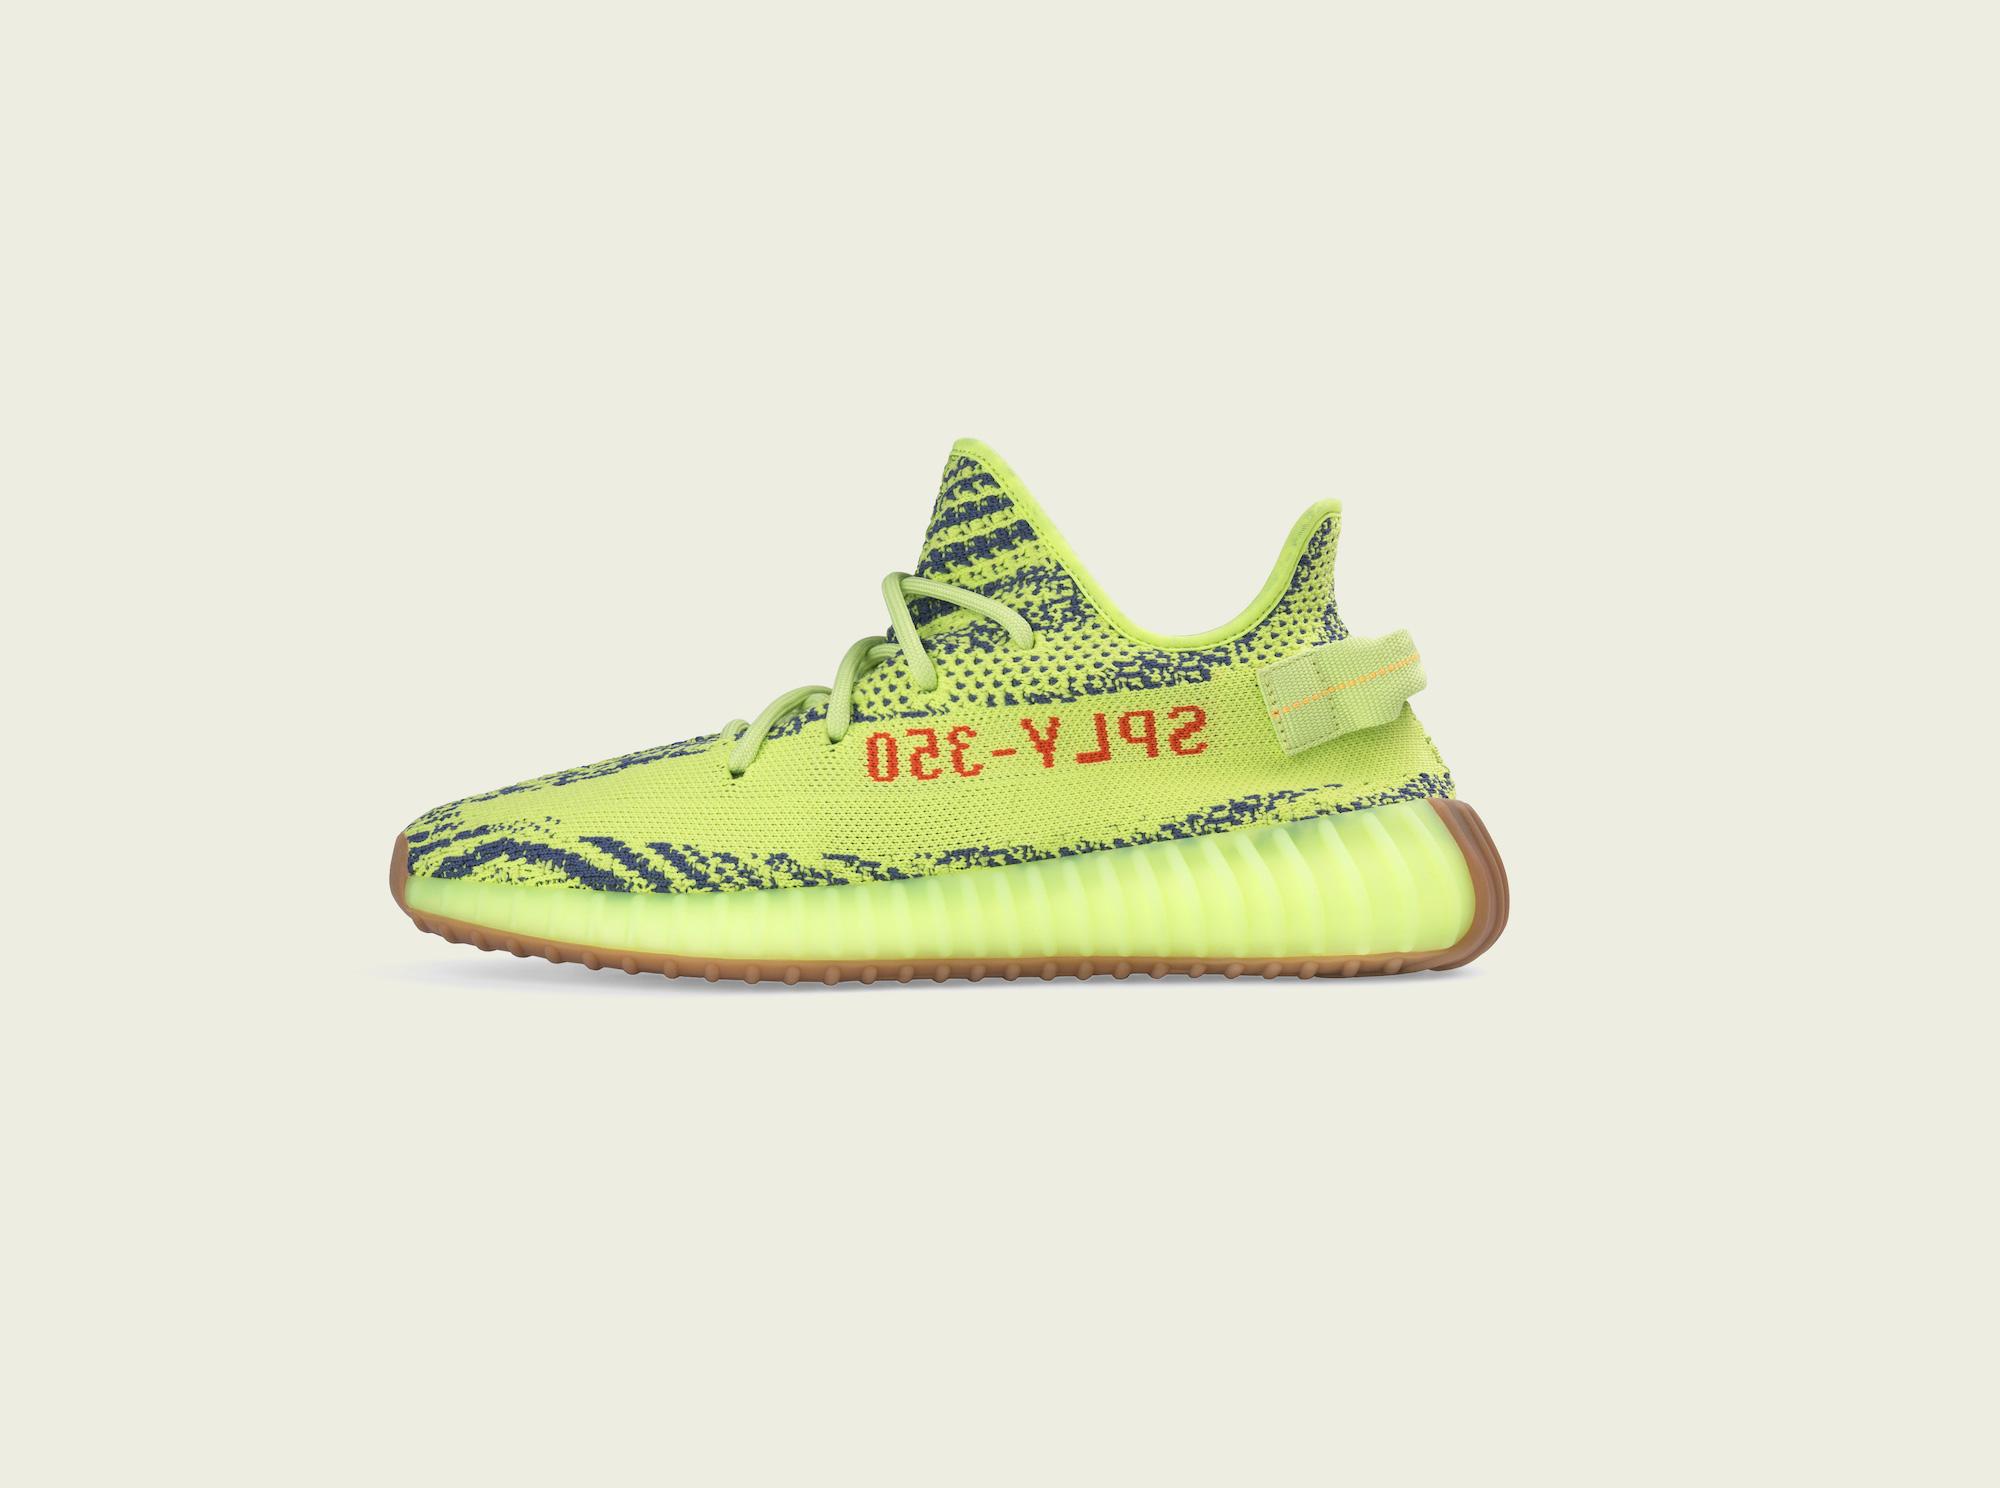 Yeezy Boost 350 V2 Semi Frozen Yellow 1